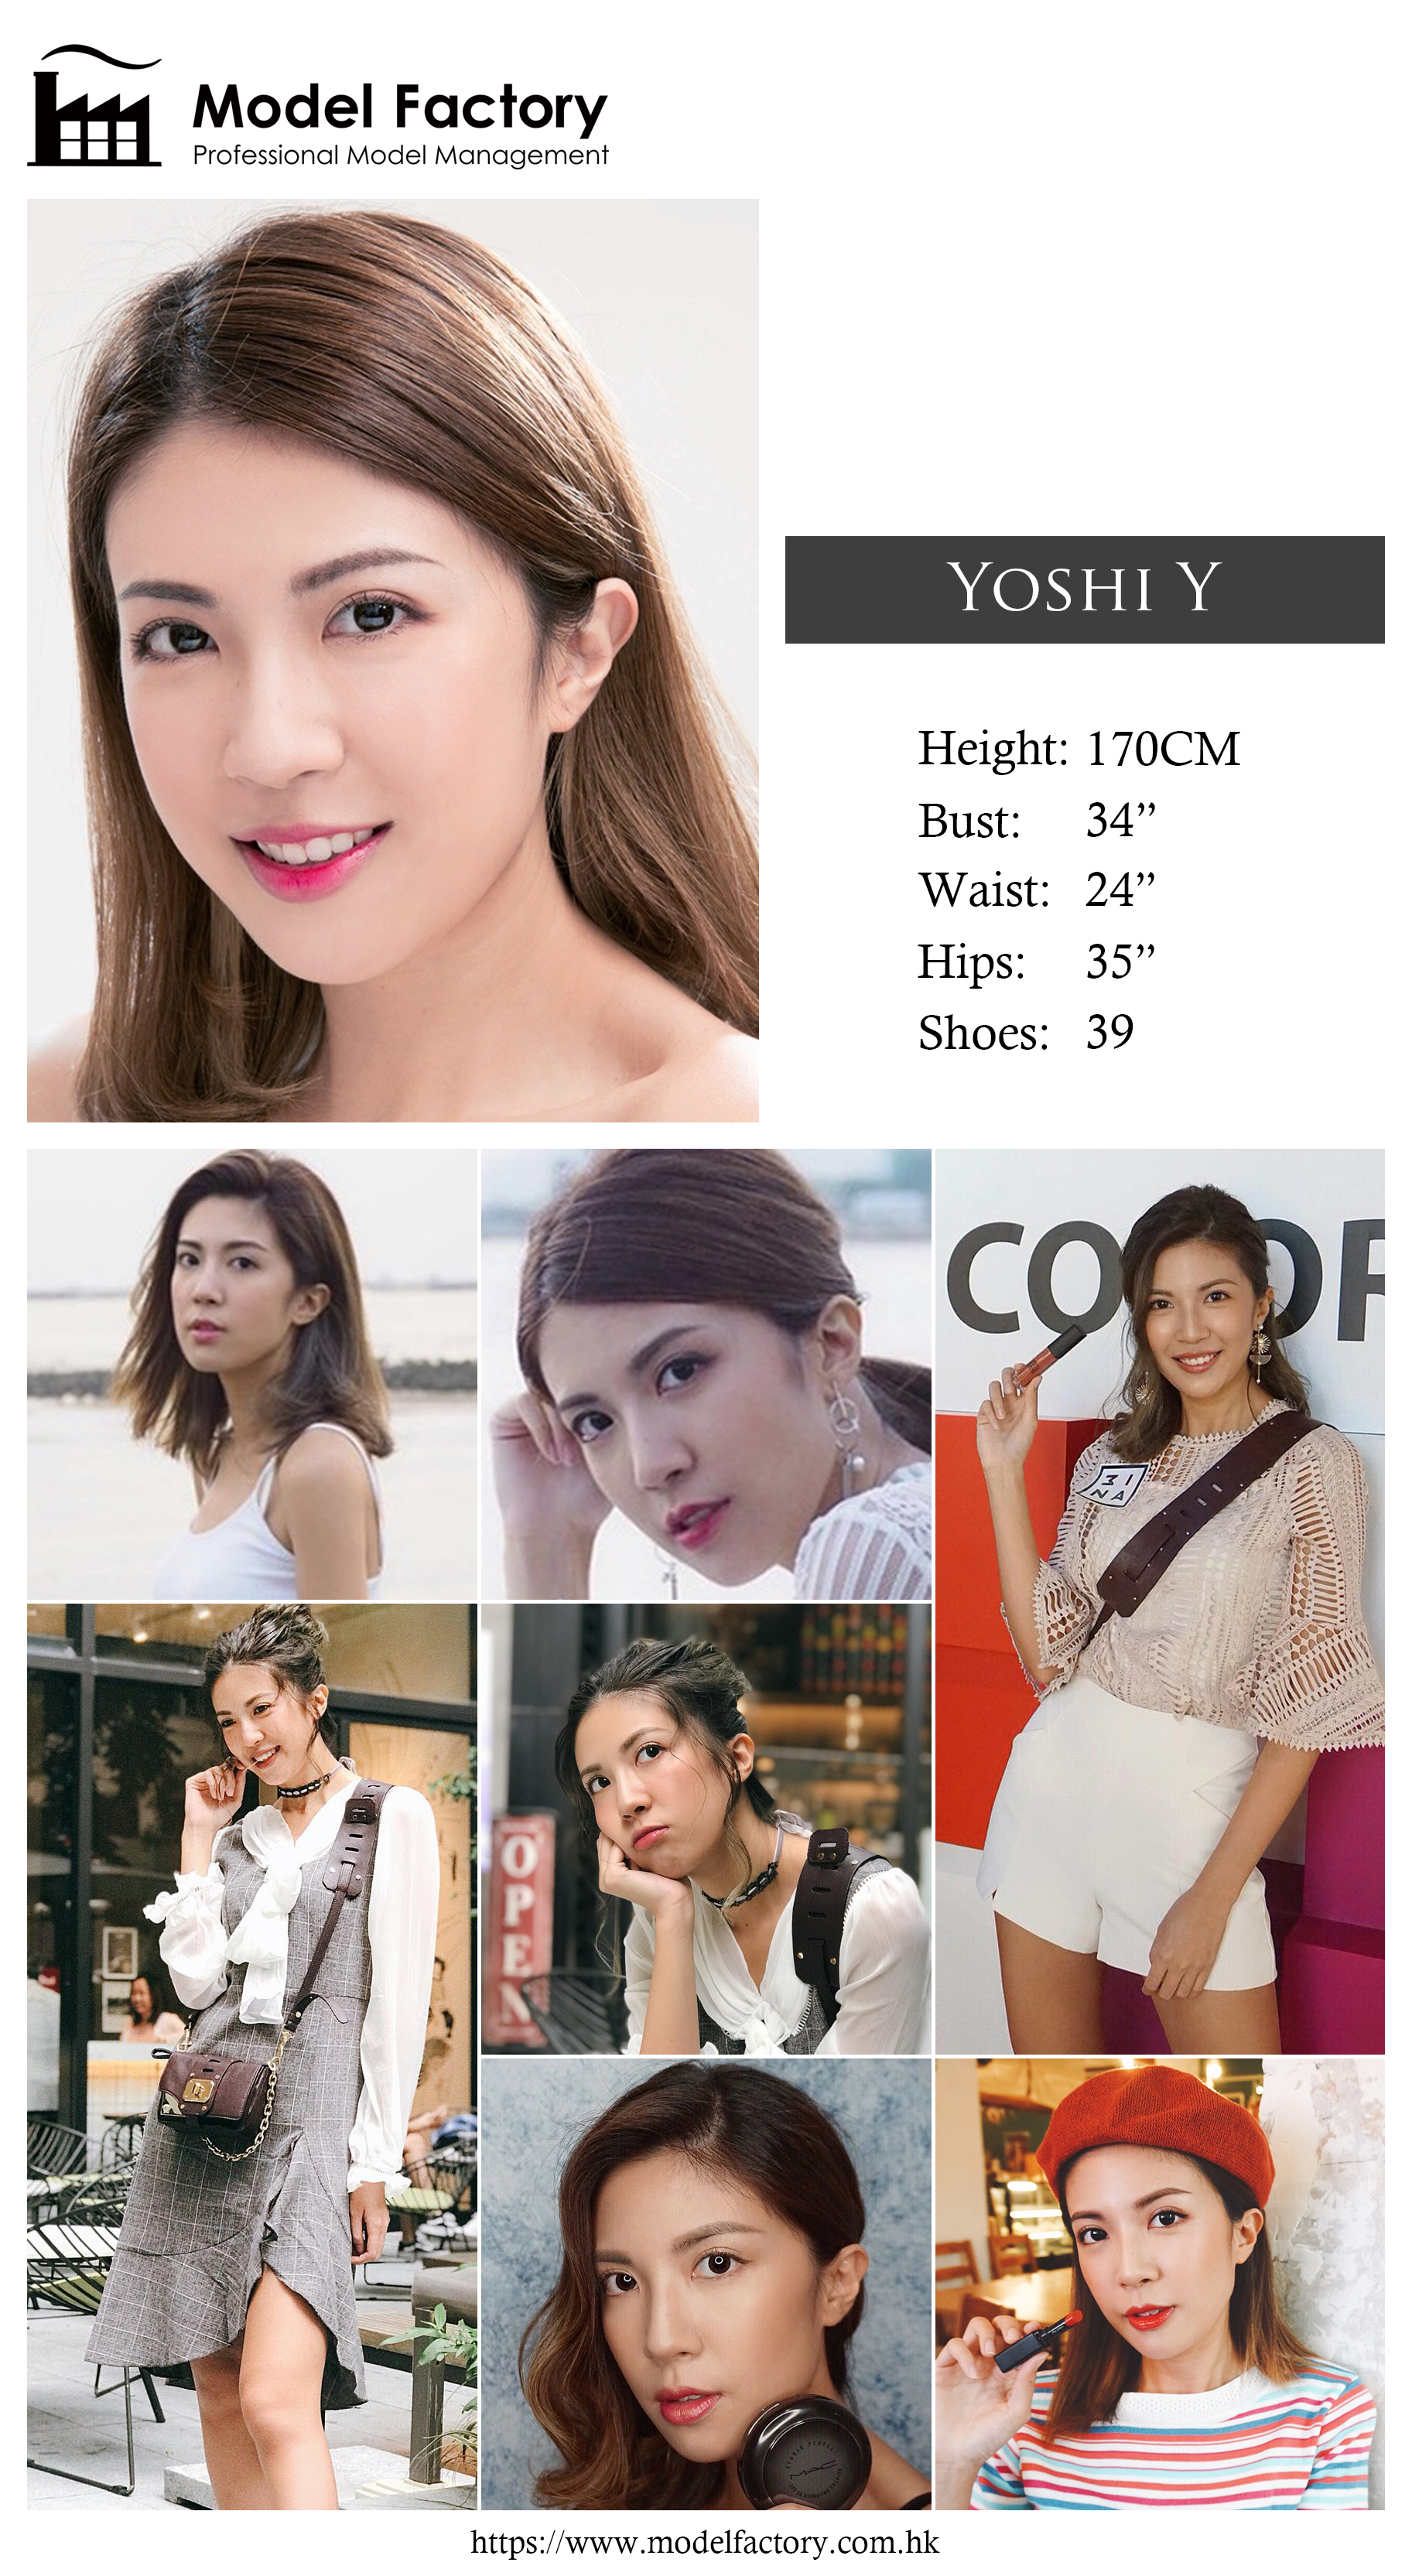 Model Factory Hong Kong Female Model YoshiY